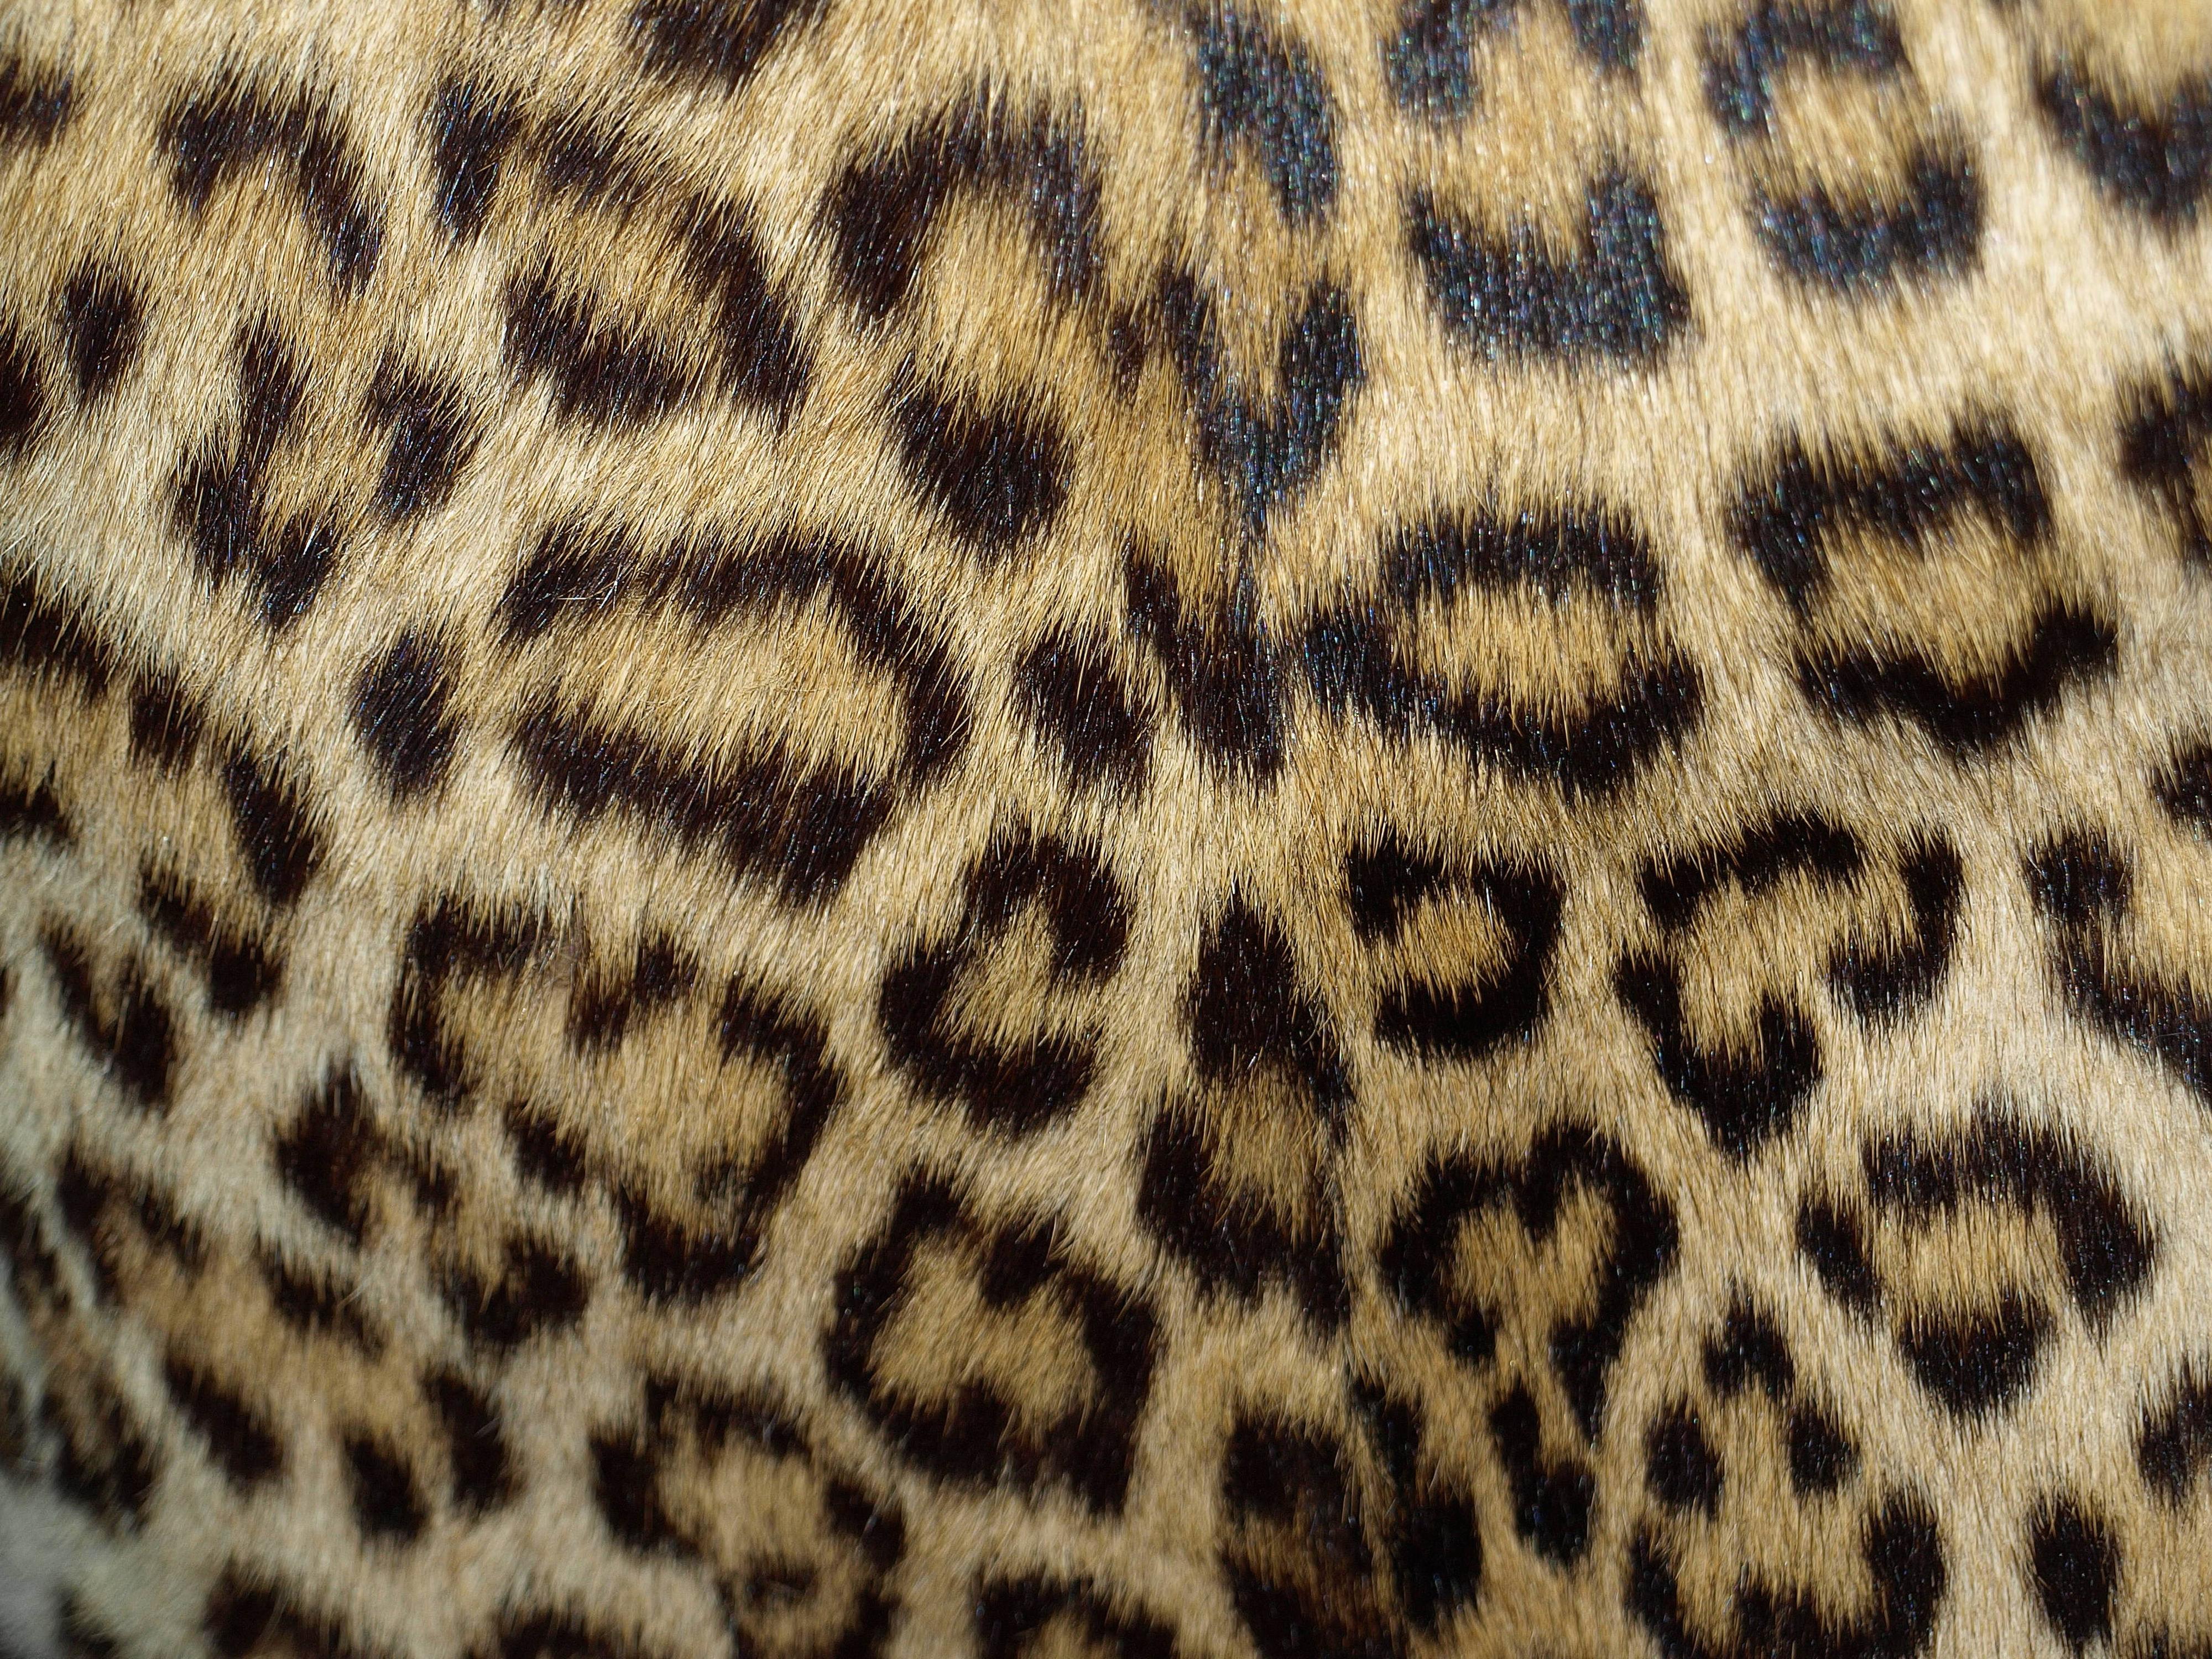 Leopard Skin clipart background Skin full size Yopriceville Leopard